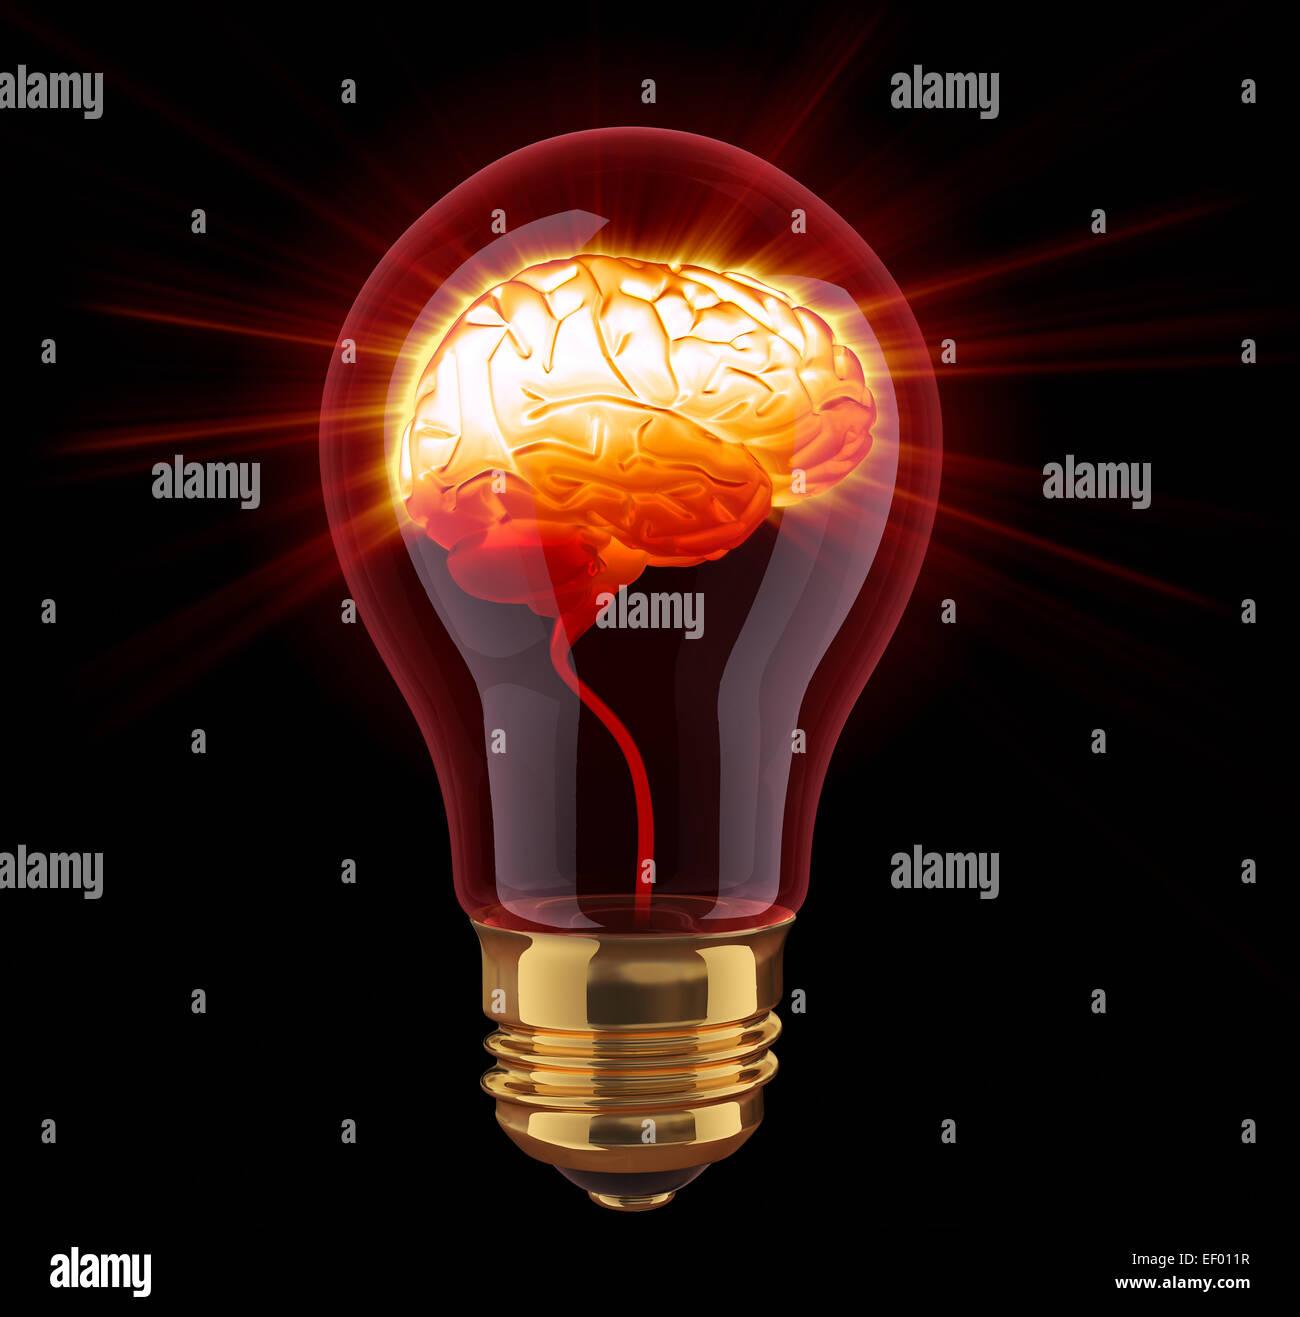 Light Bulb With Shining Brain Inside   Stock Image